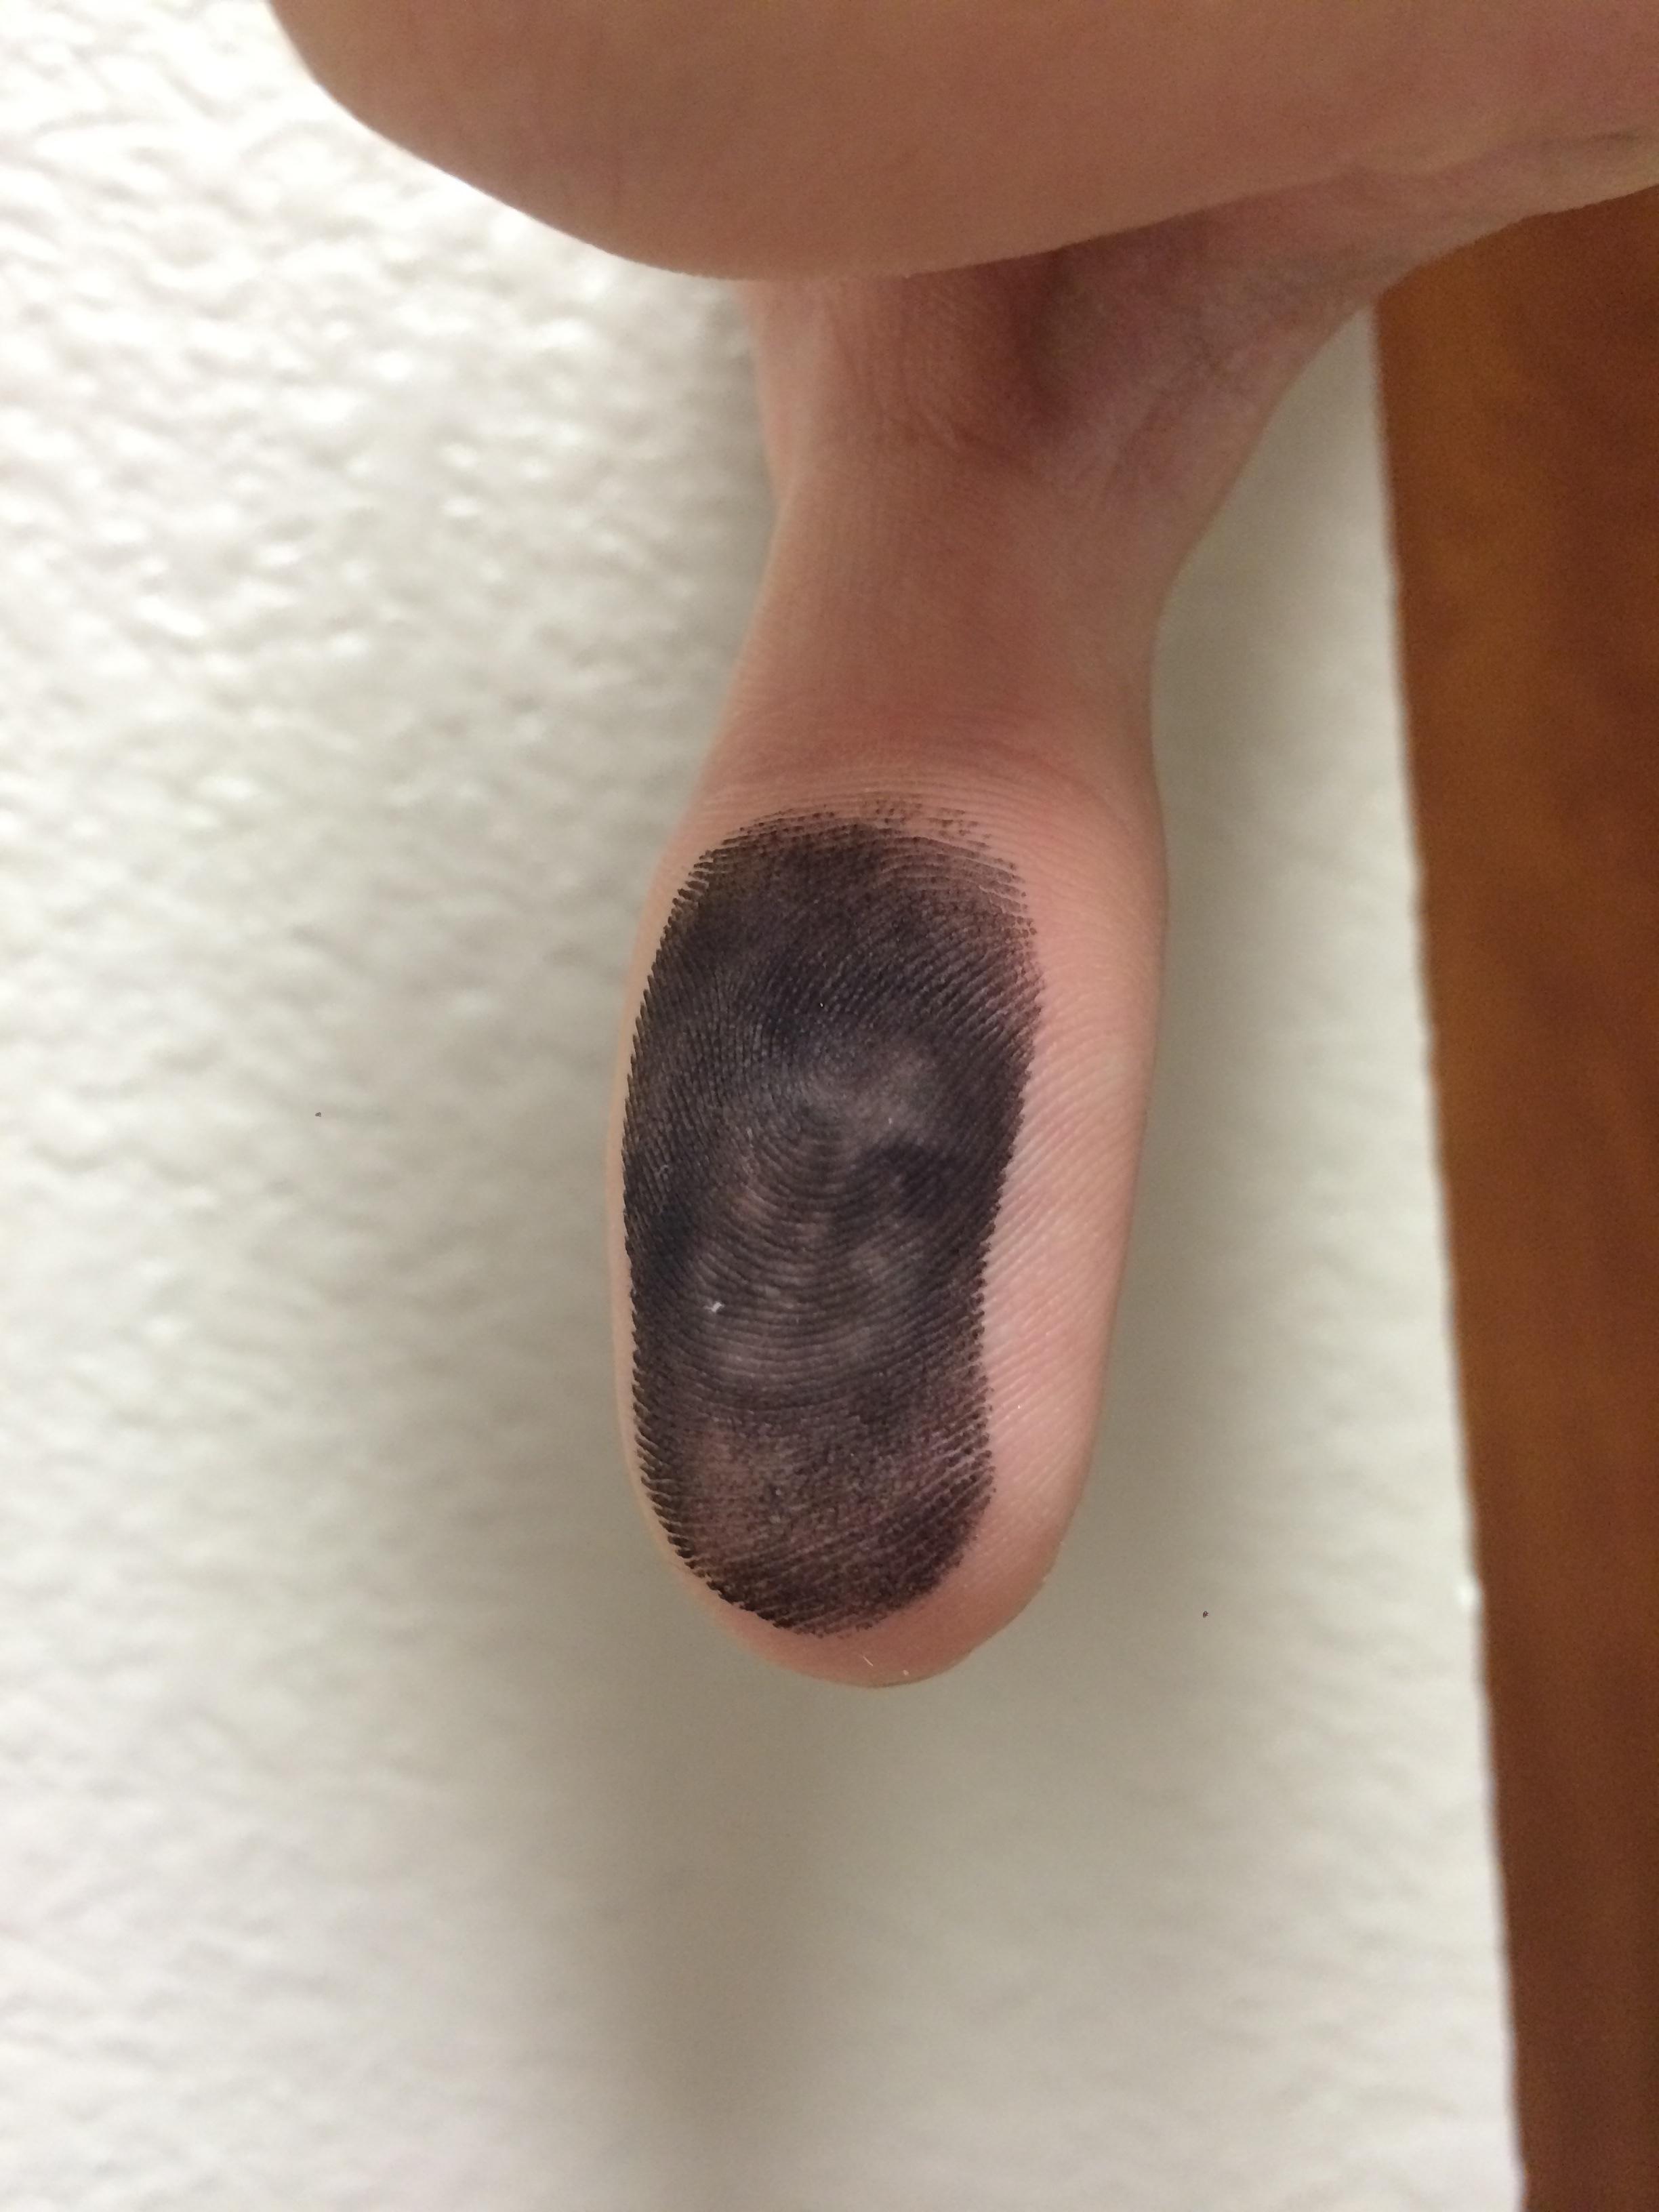 Ada penampakan wajah di sidik jari pria ini